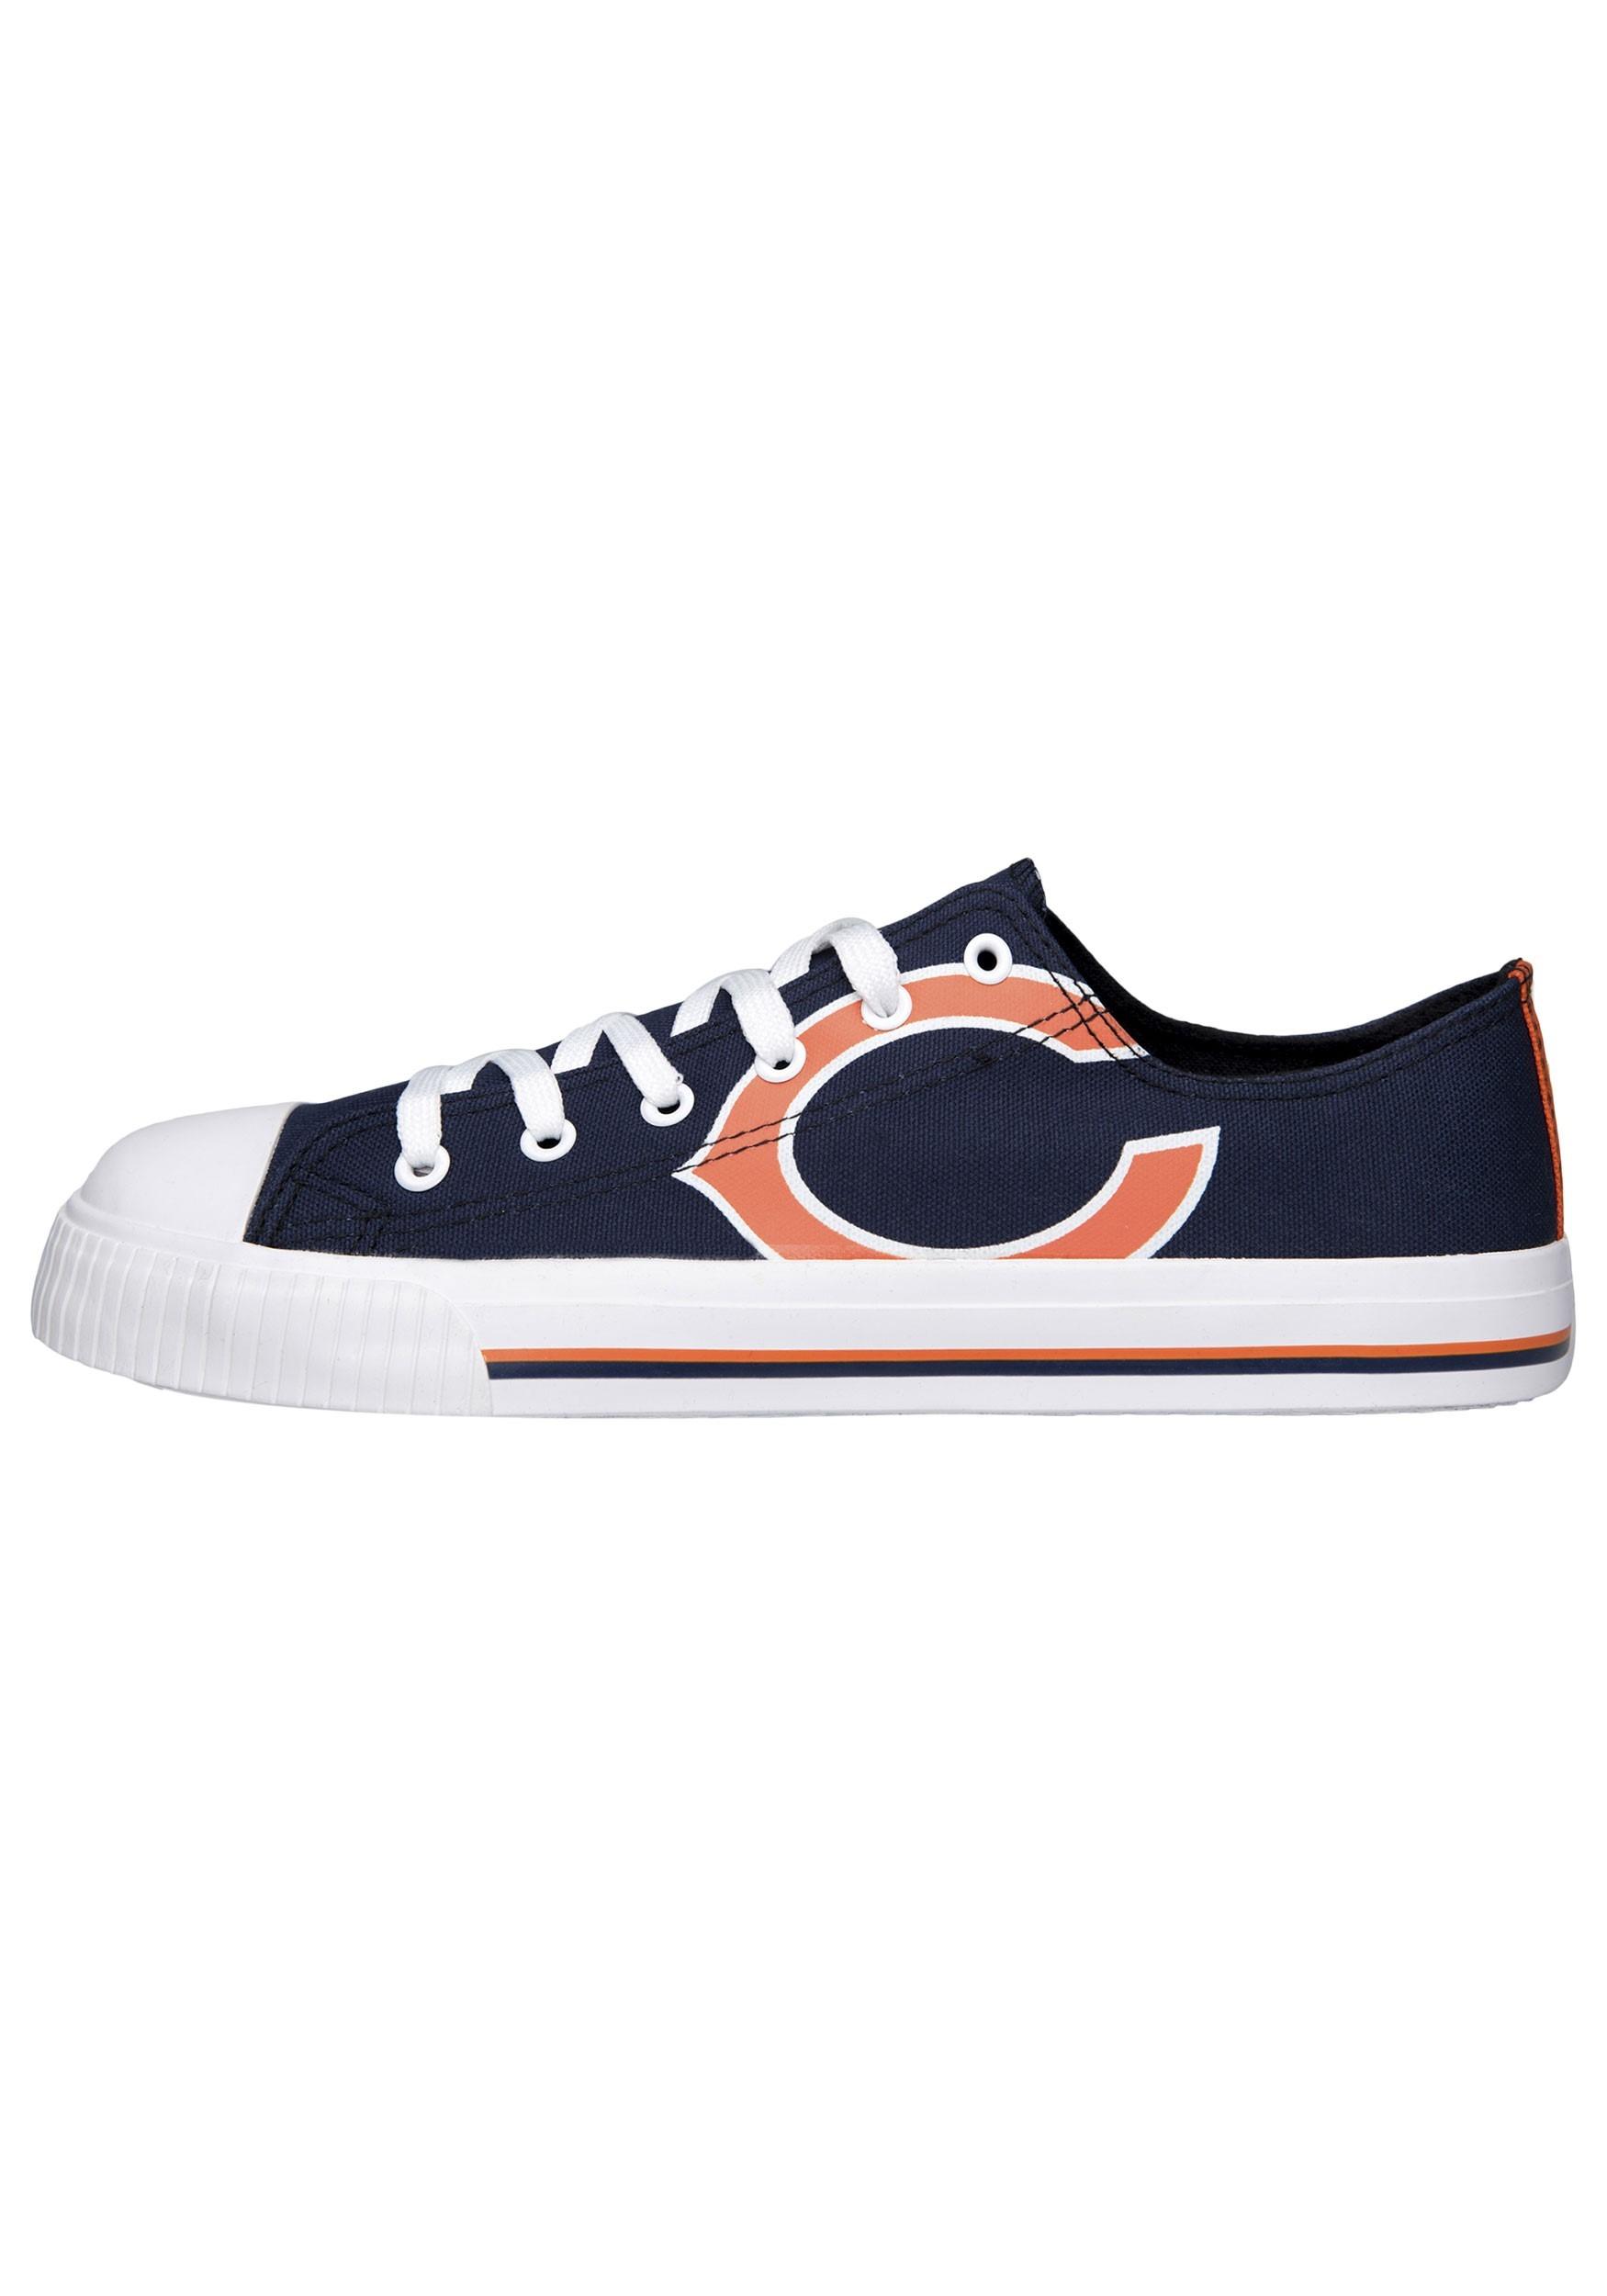 wholesale dealer 51b27 f2265 Bears Low Top Canvas Shoe Youth